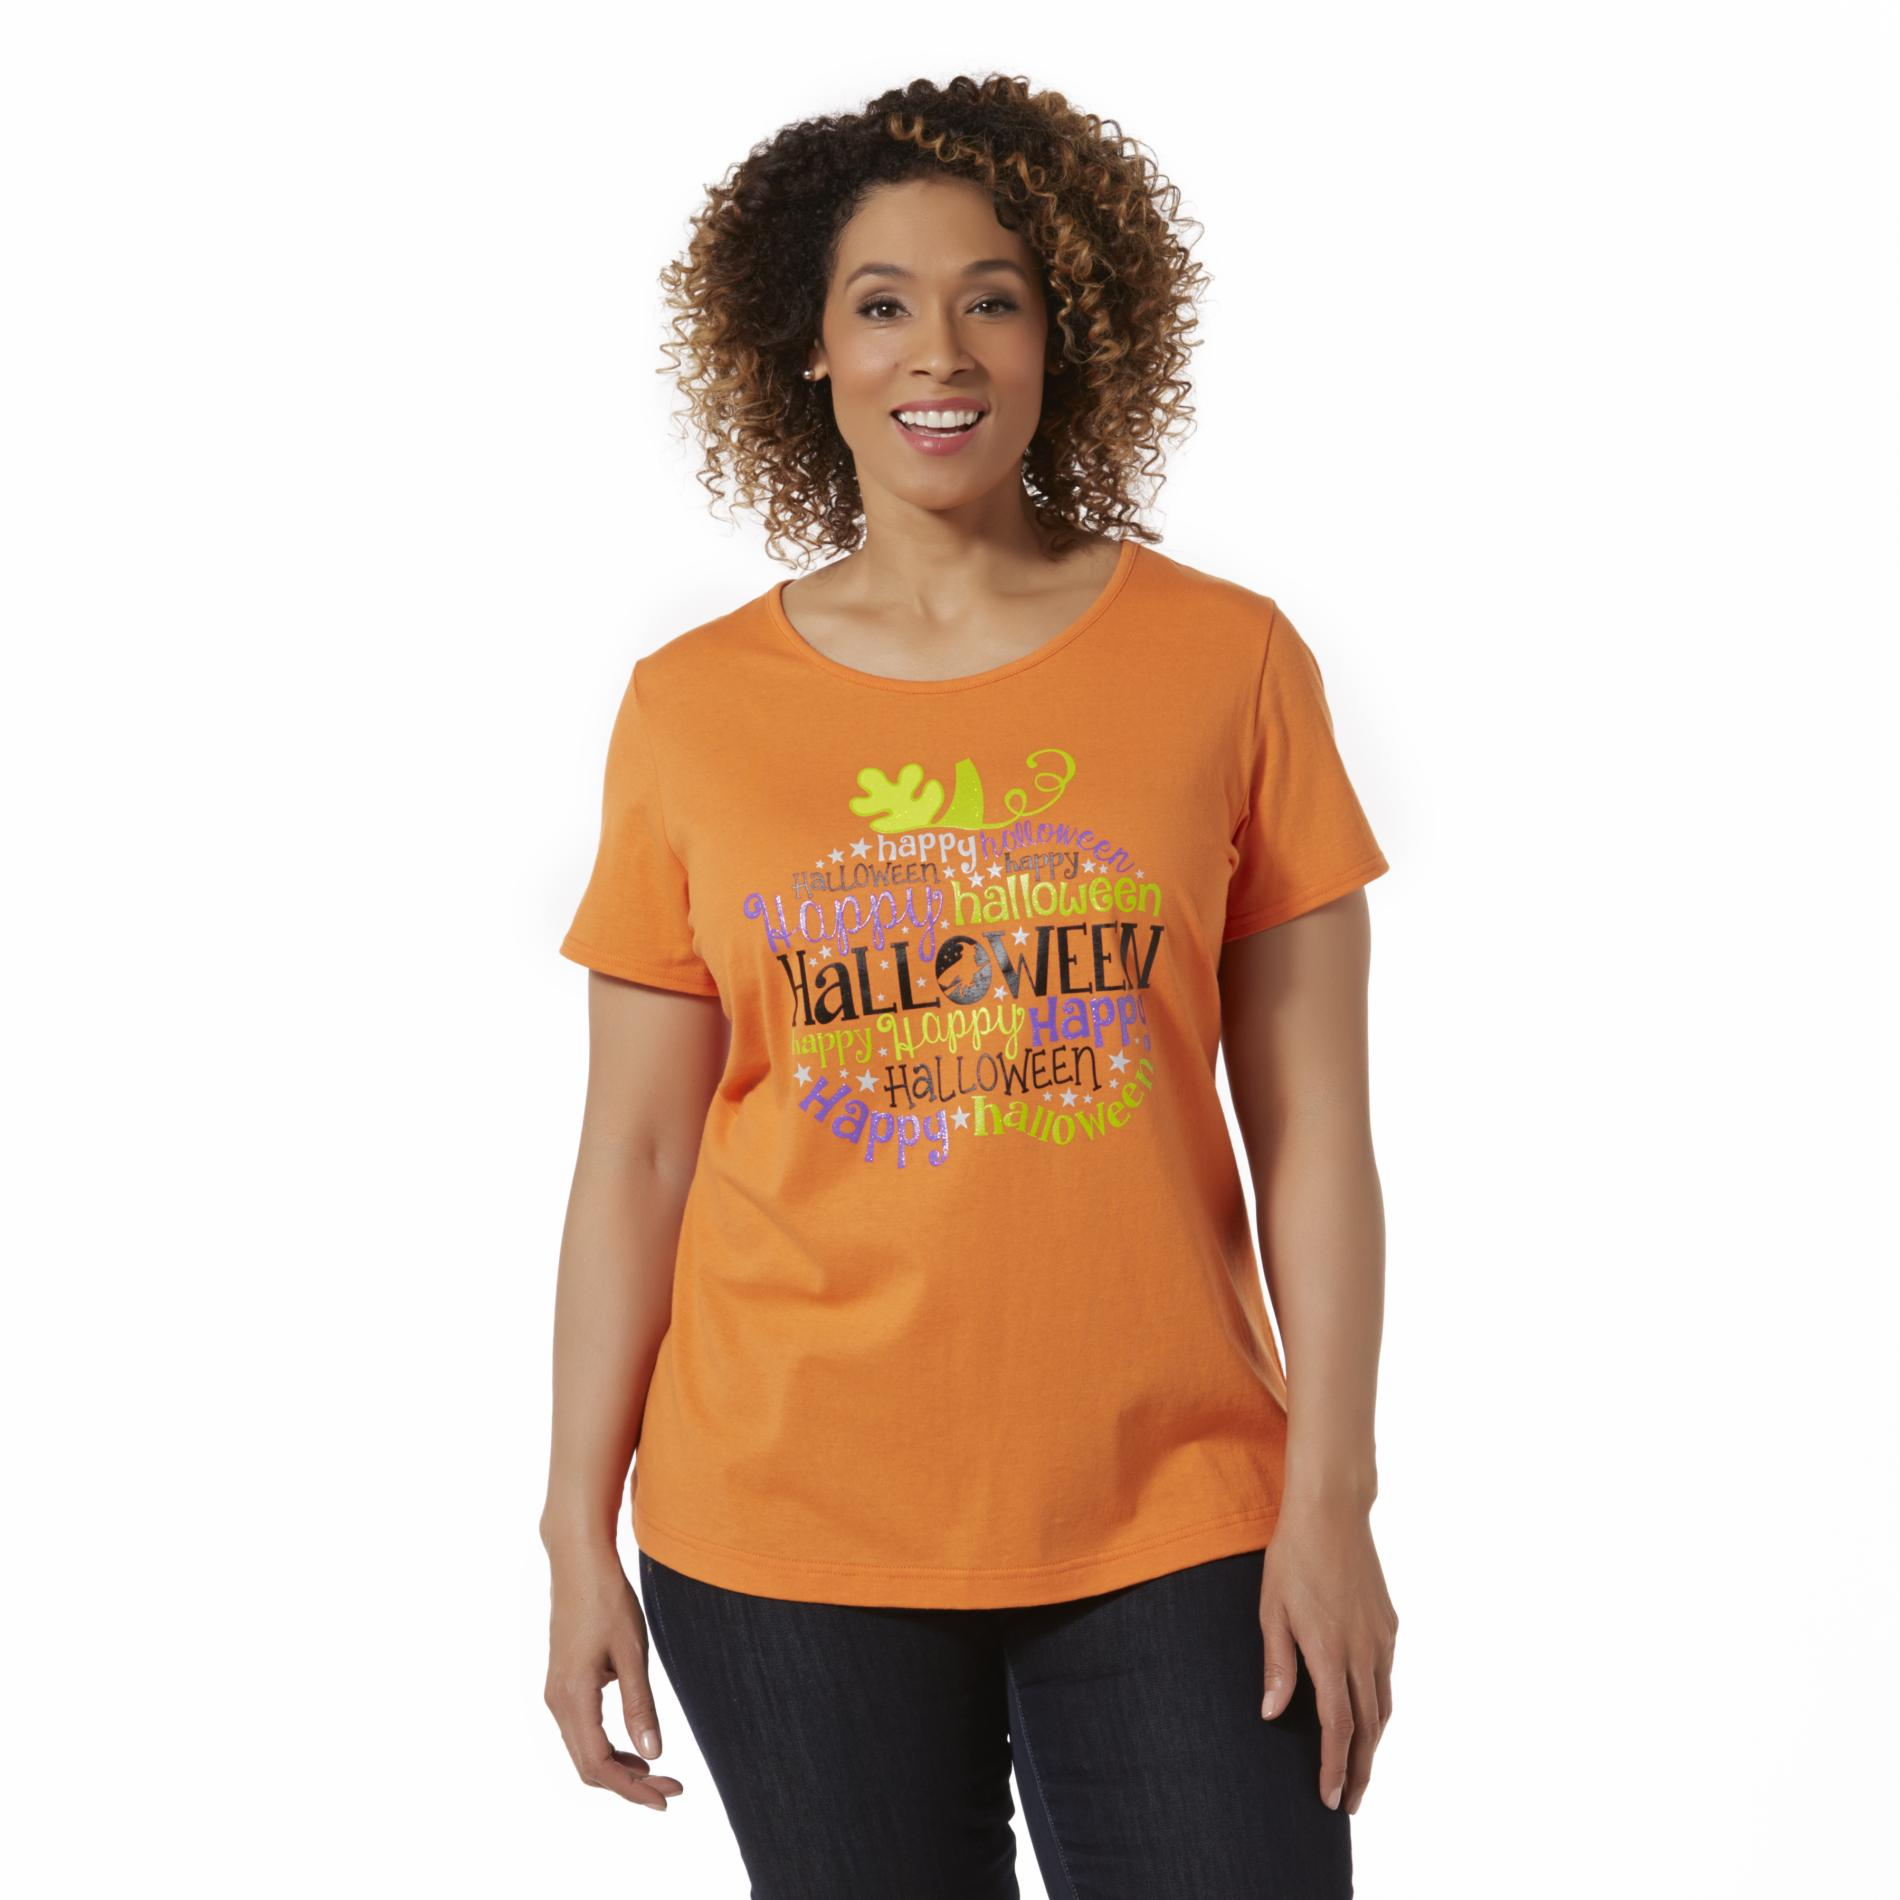 Women's Plus Graphic T-Shirt - Happy Halloween